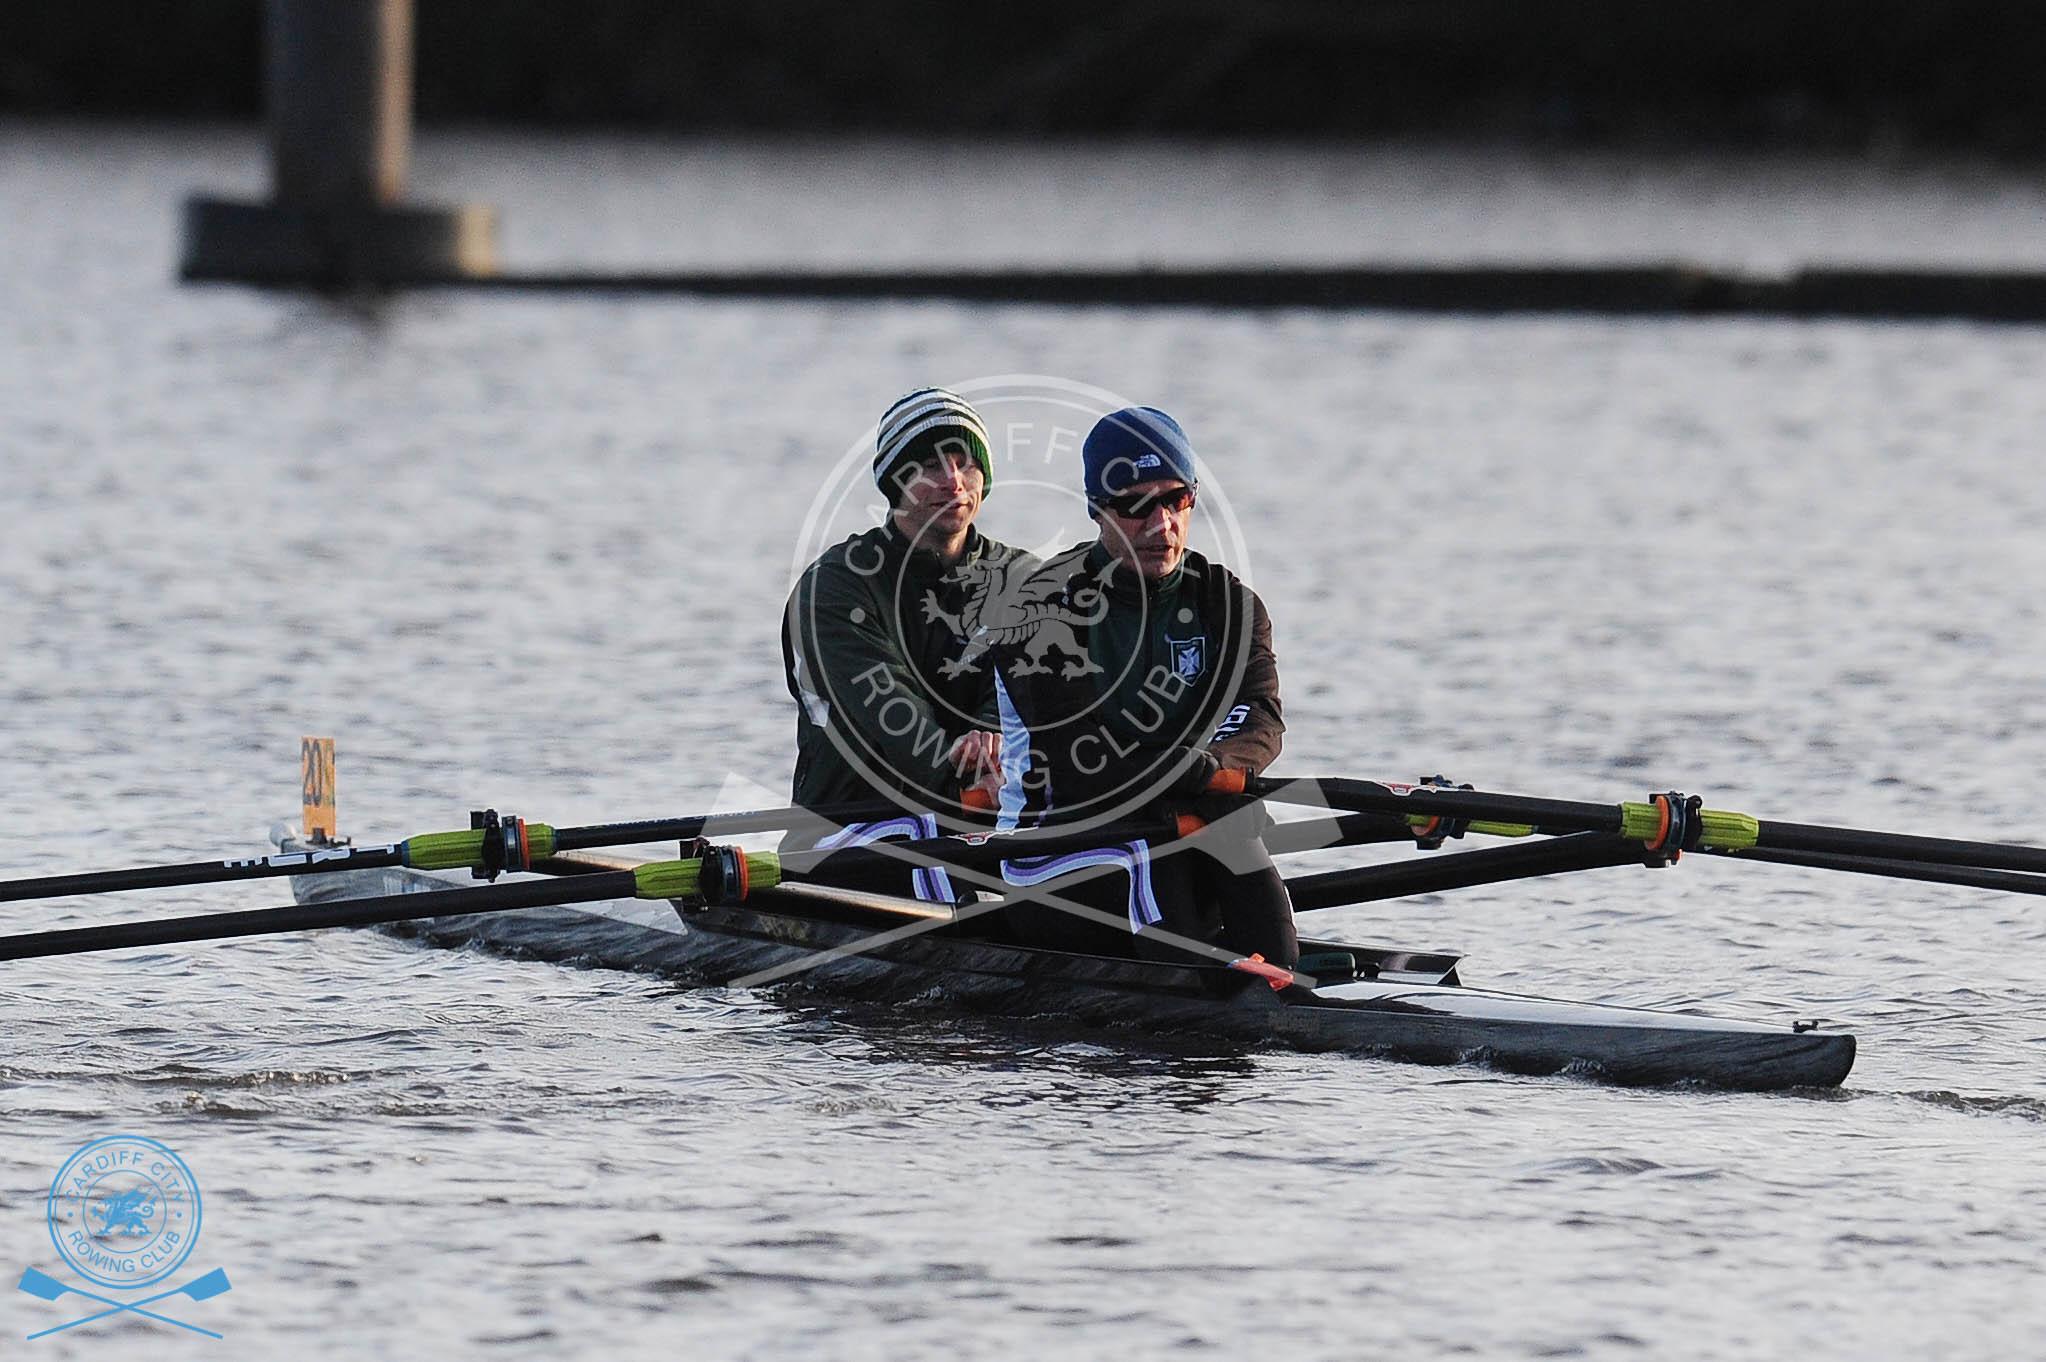 DW_280119_Cardiff_City_Rowing_17.jpg